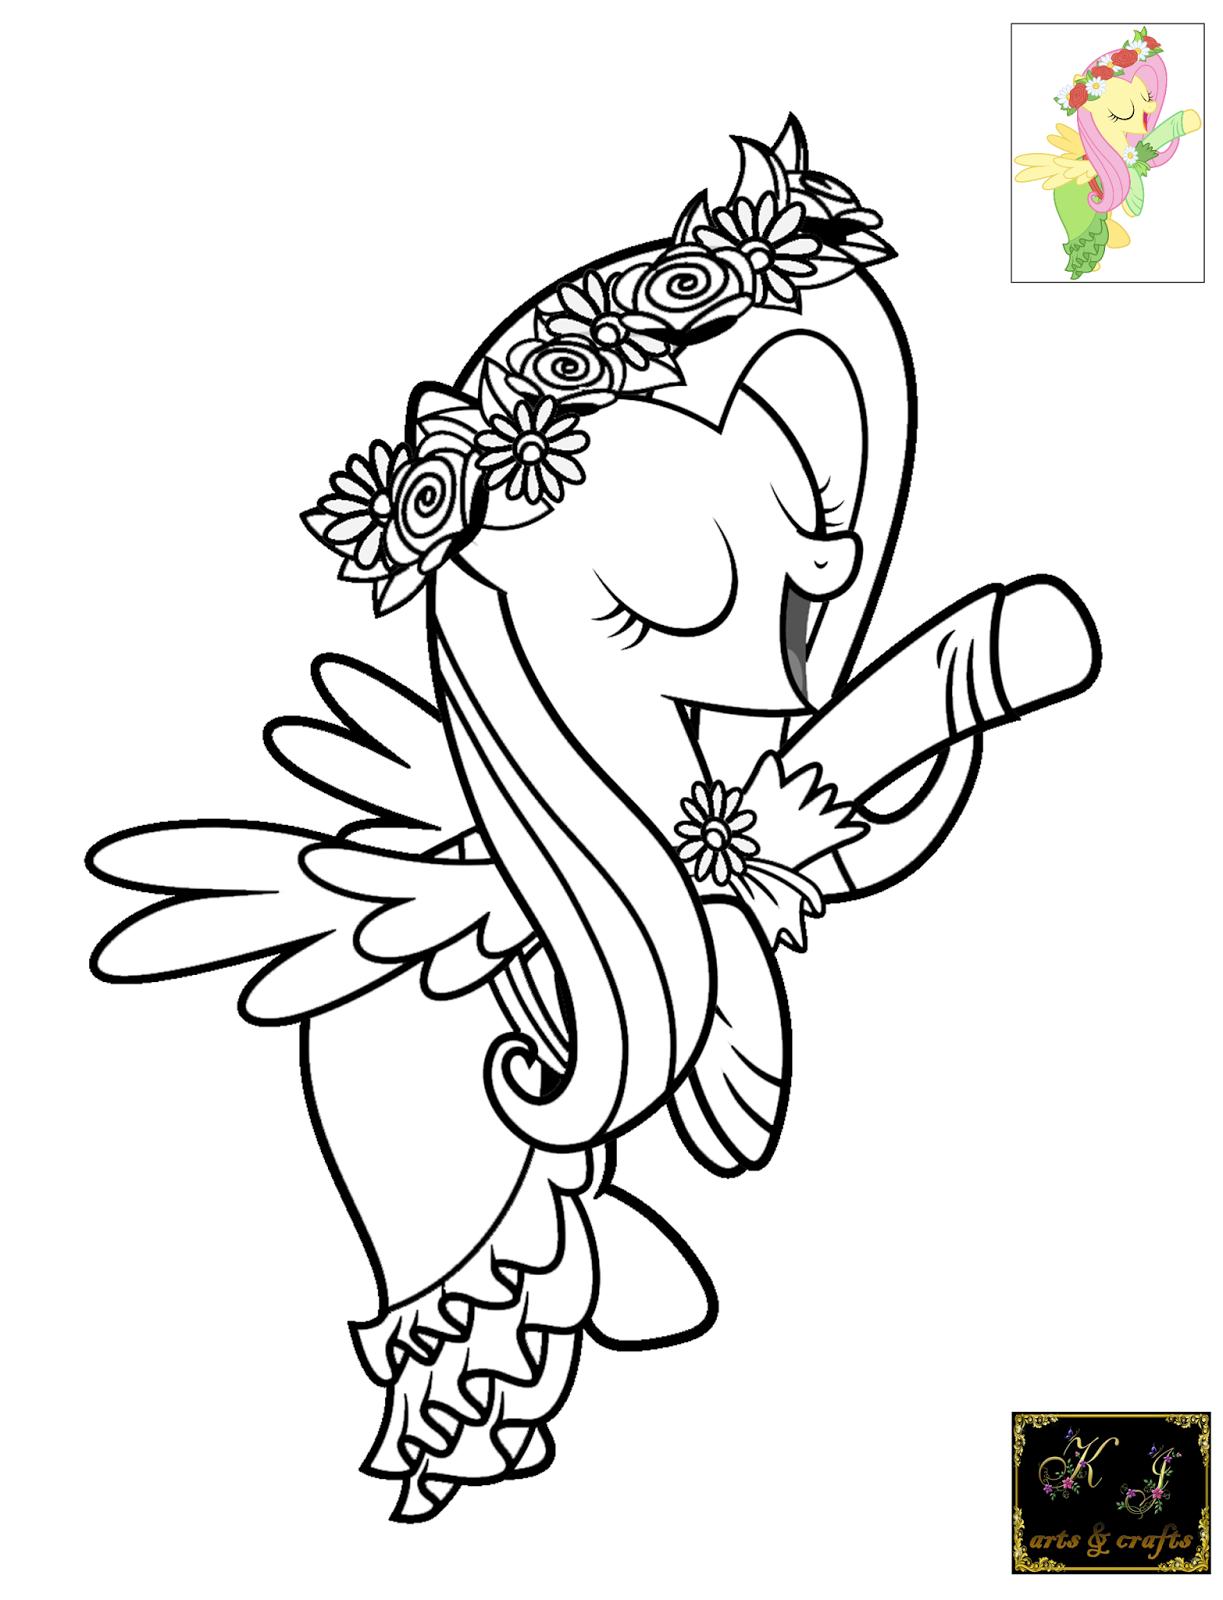 KJ Coloring Pages: Fluttershy